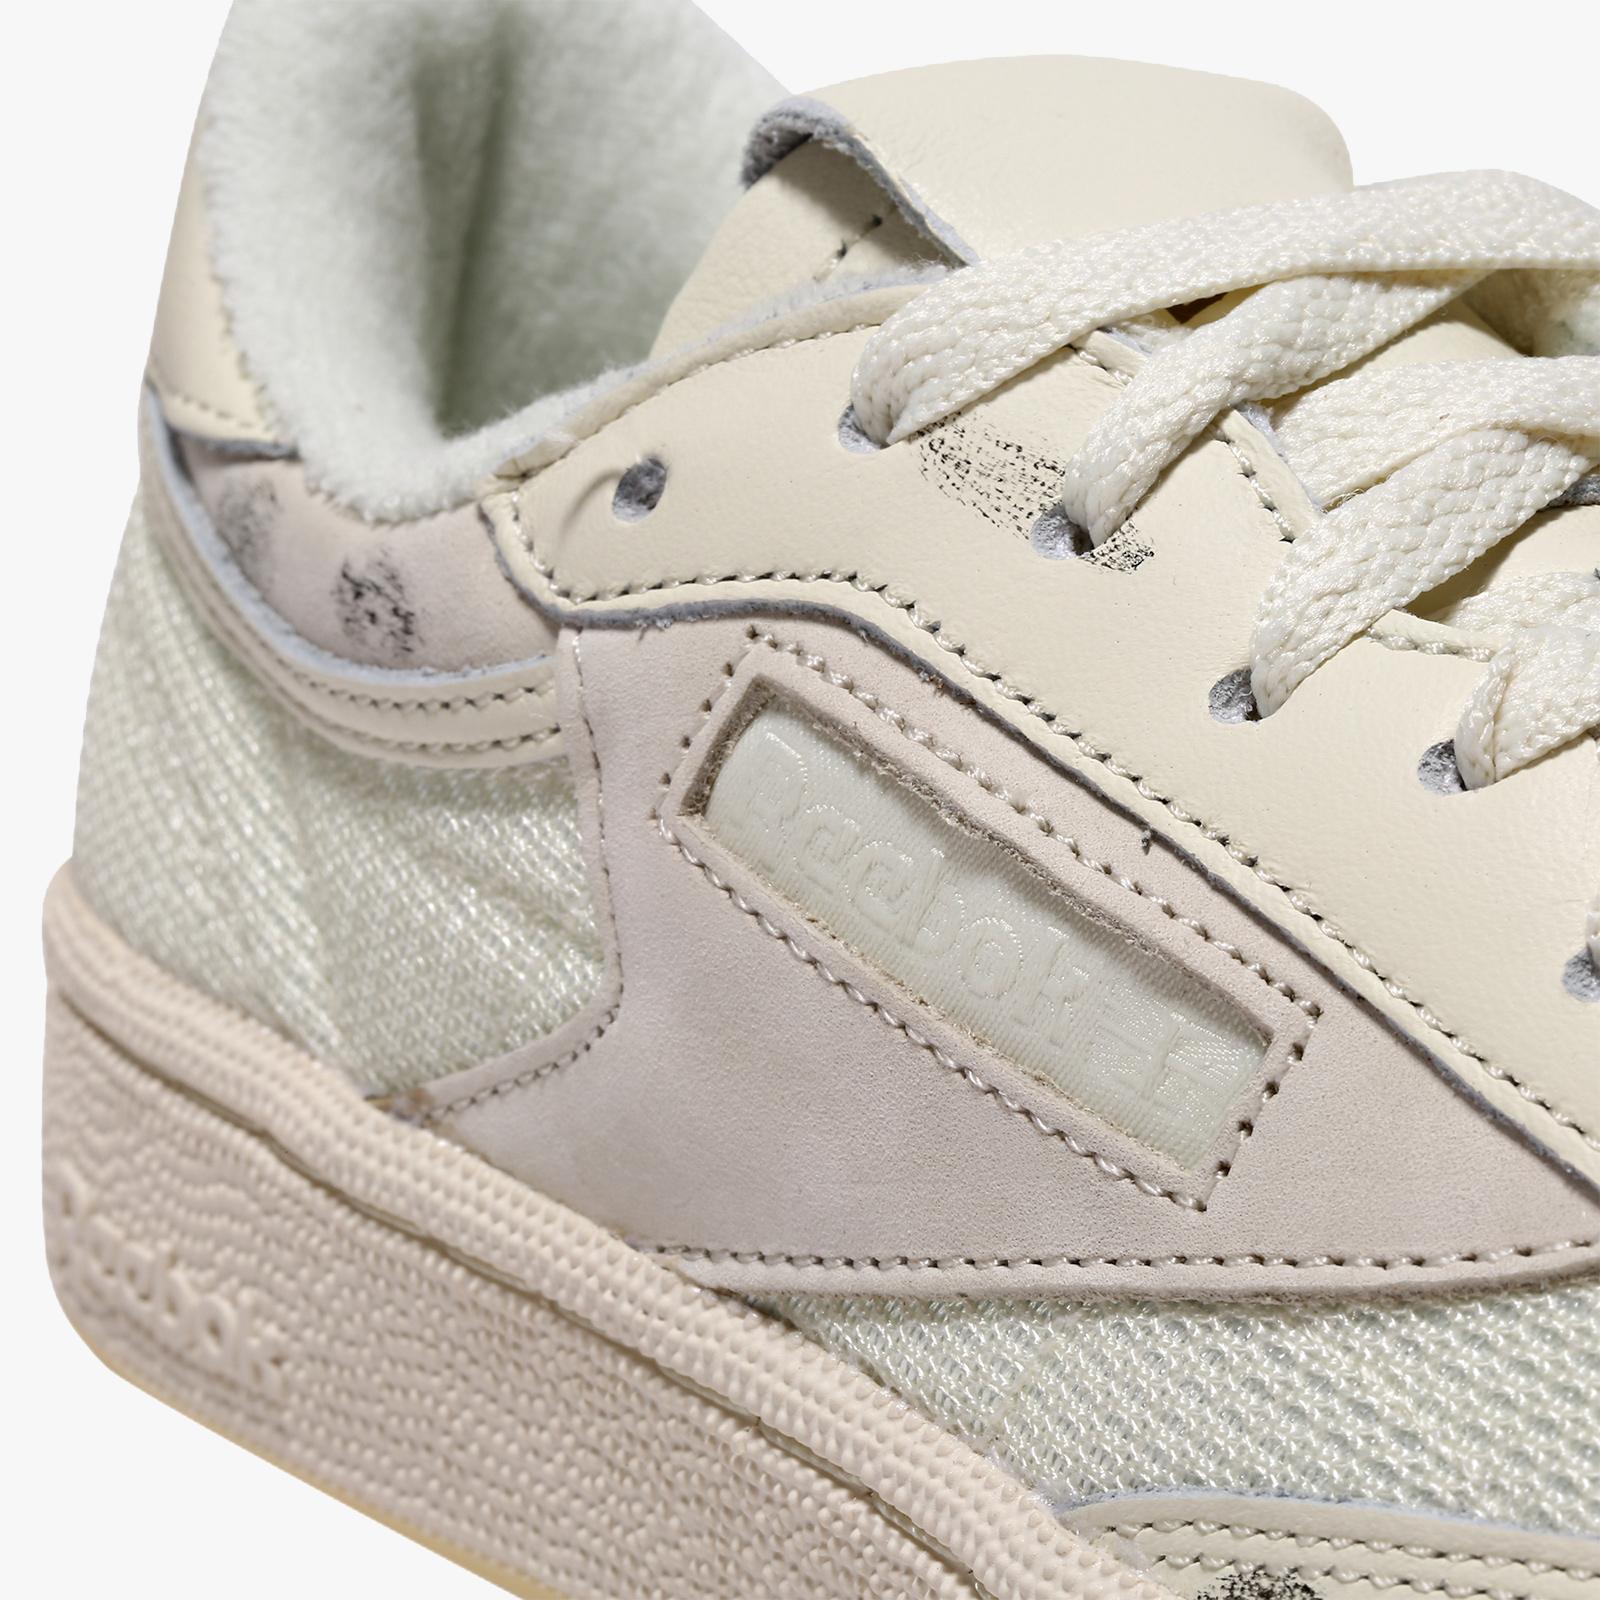 002e68ca54e Reebok Club C 85 x Walk Of Shame - Cn6982 - Sneakersnstuff ...